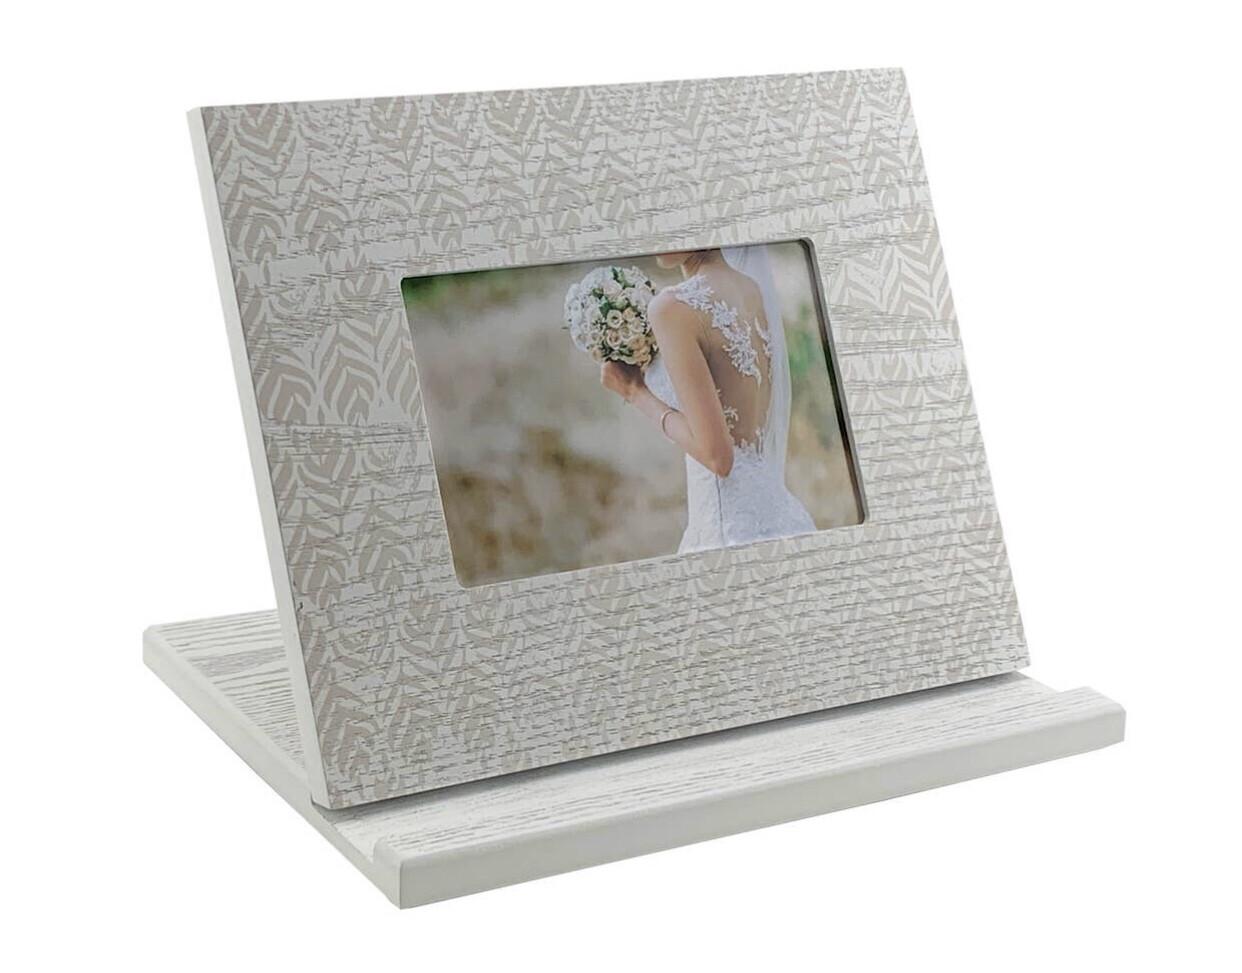 Serenity Tablet Stand/Frame